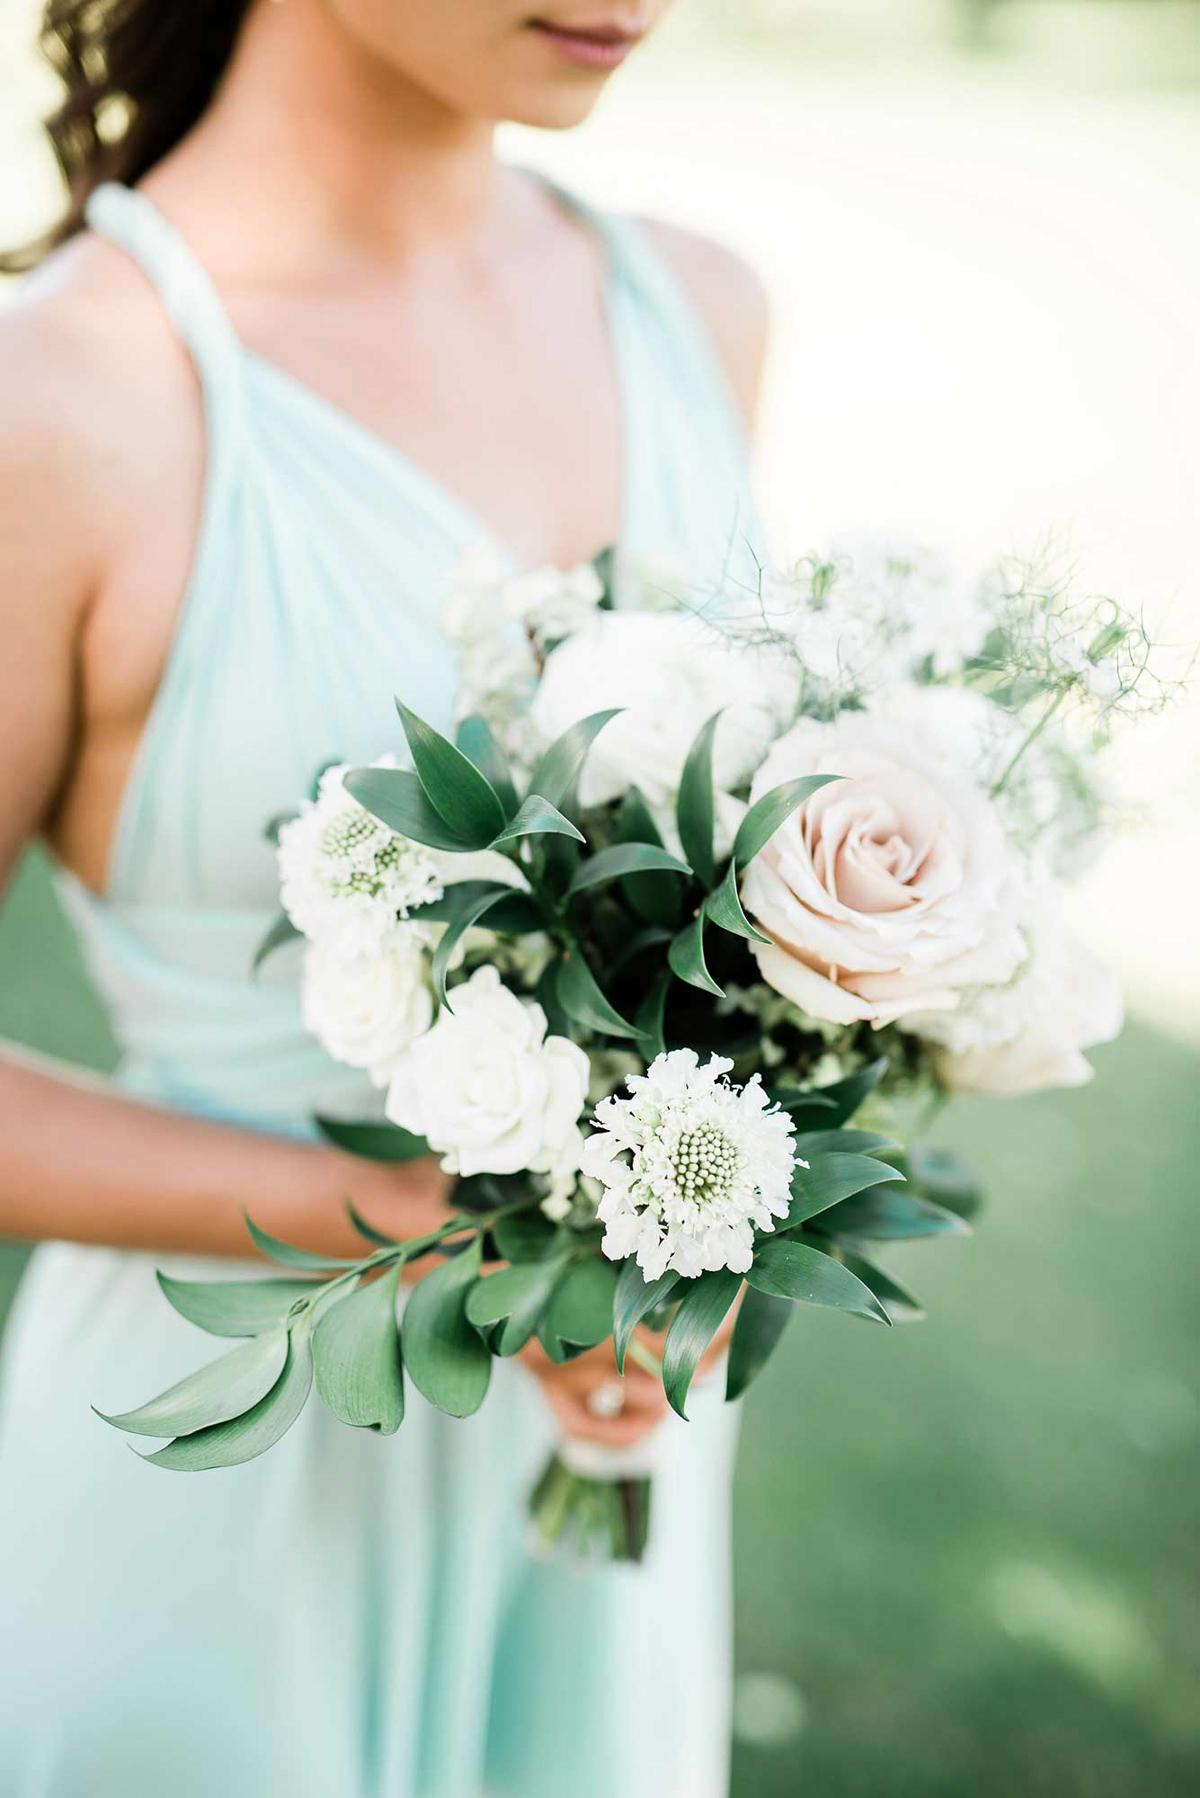 destiny-dawn-photography-vineyard-bride-swish-list-knollwood-golf-and-country-club-ancaster-wedding-editorial-21.jpg